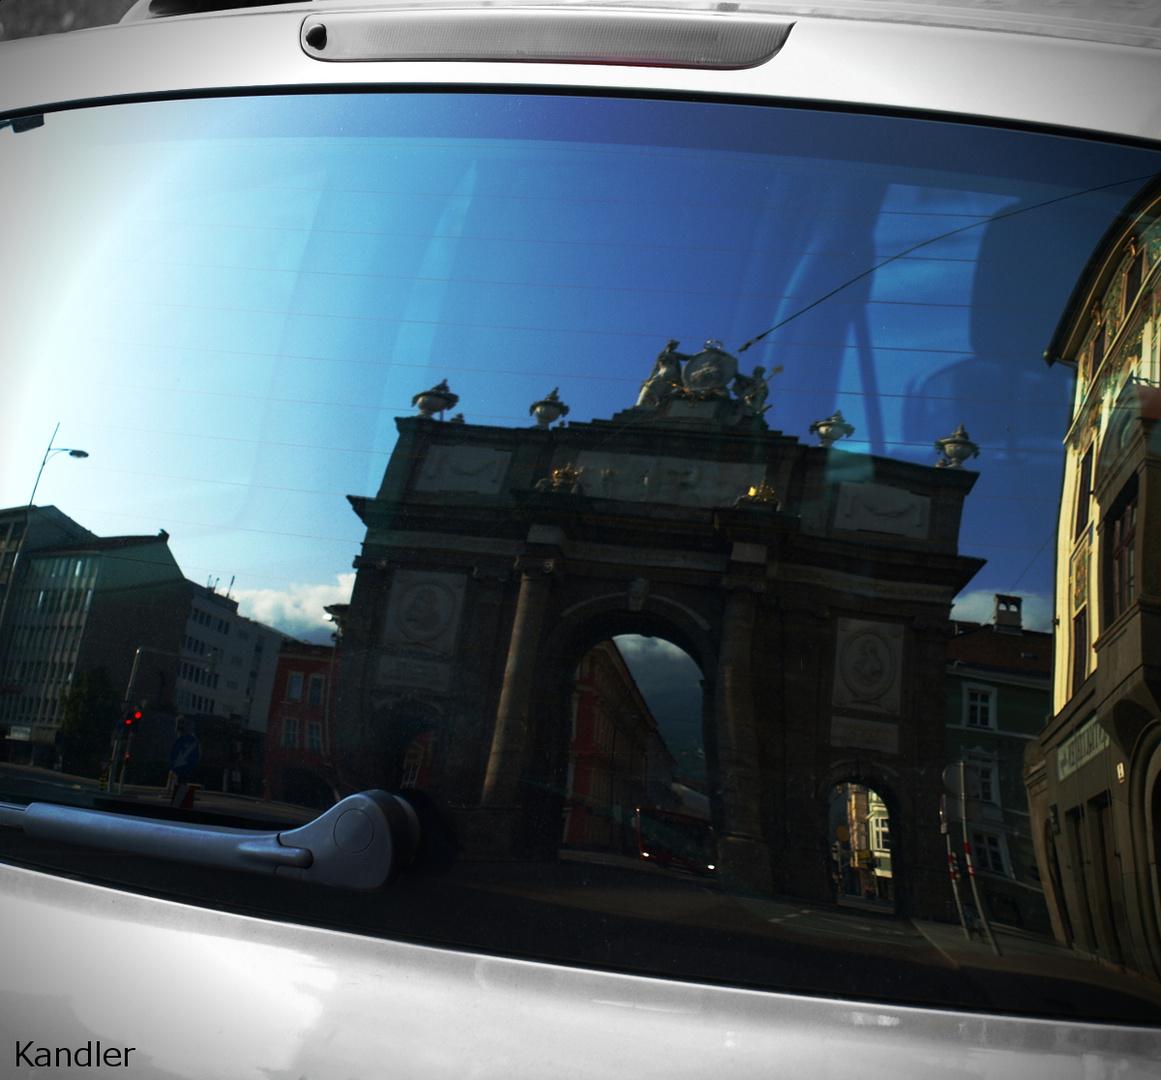 Innsbrucker Stadtperspektiven